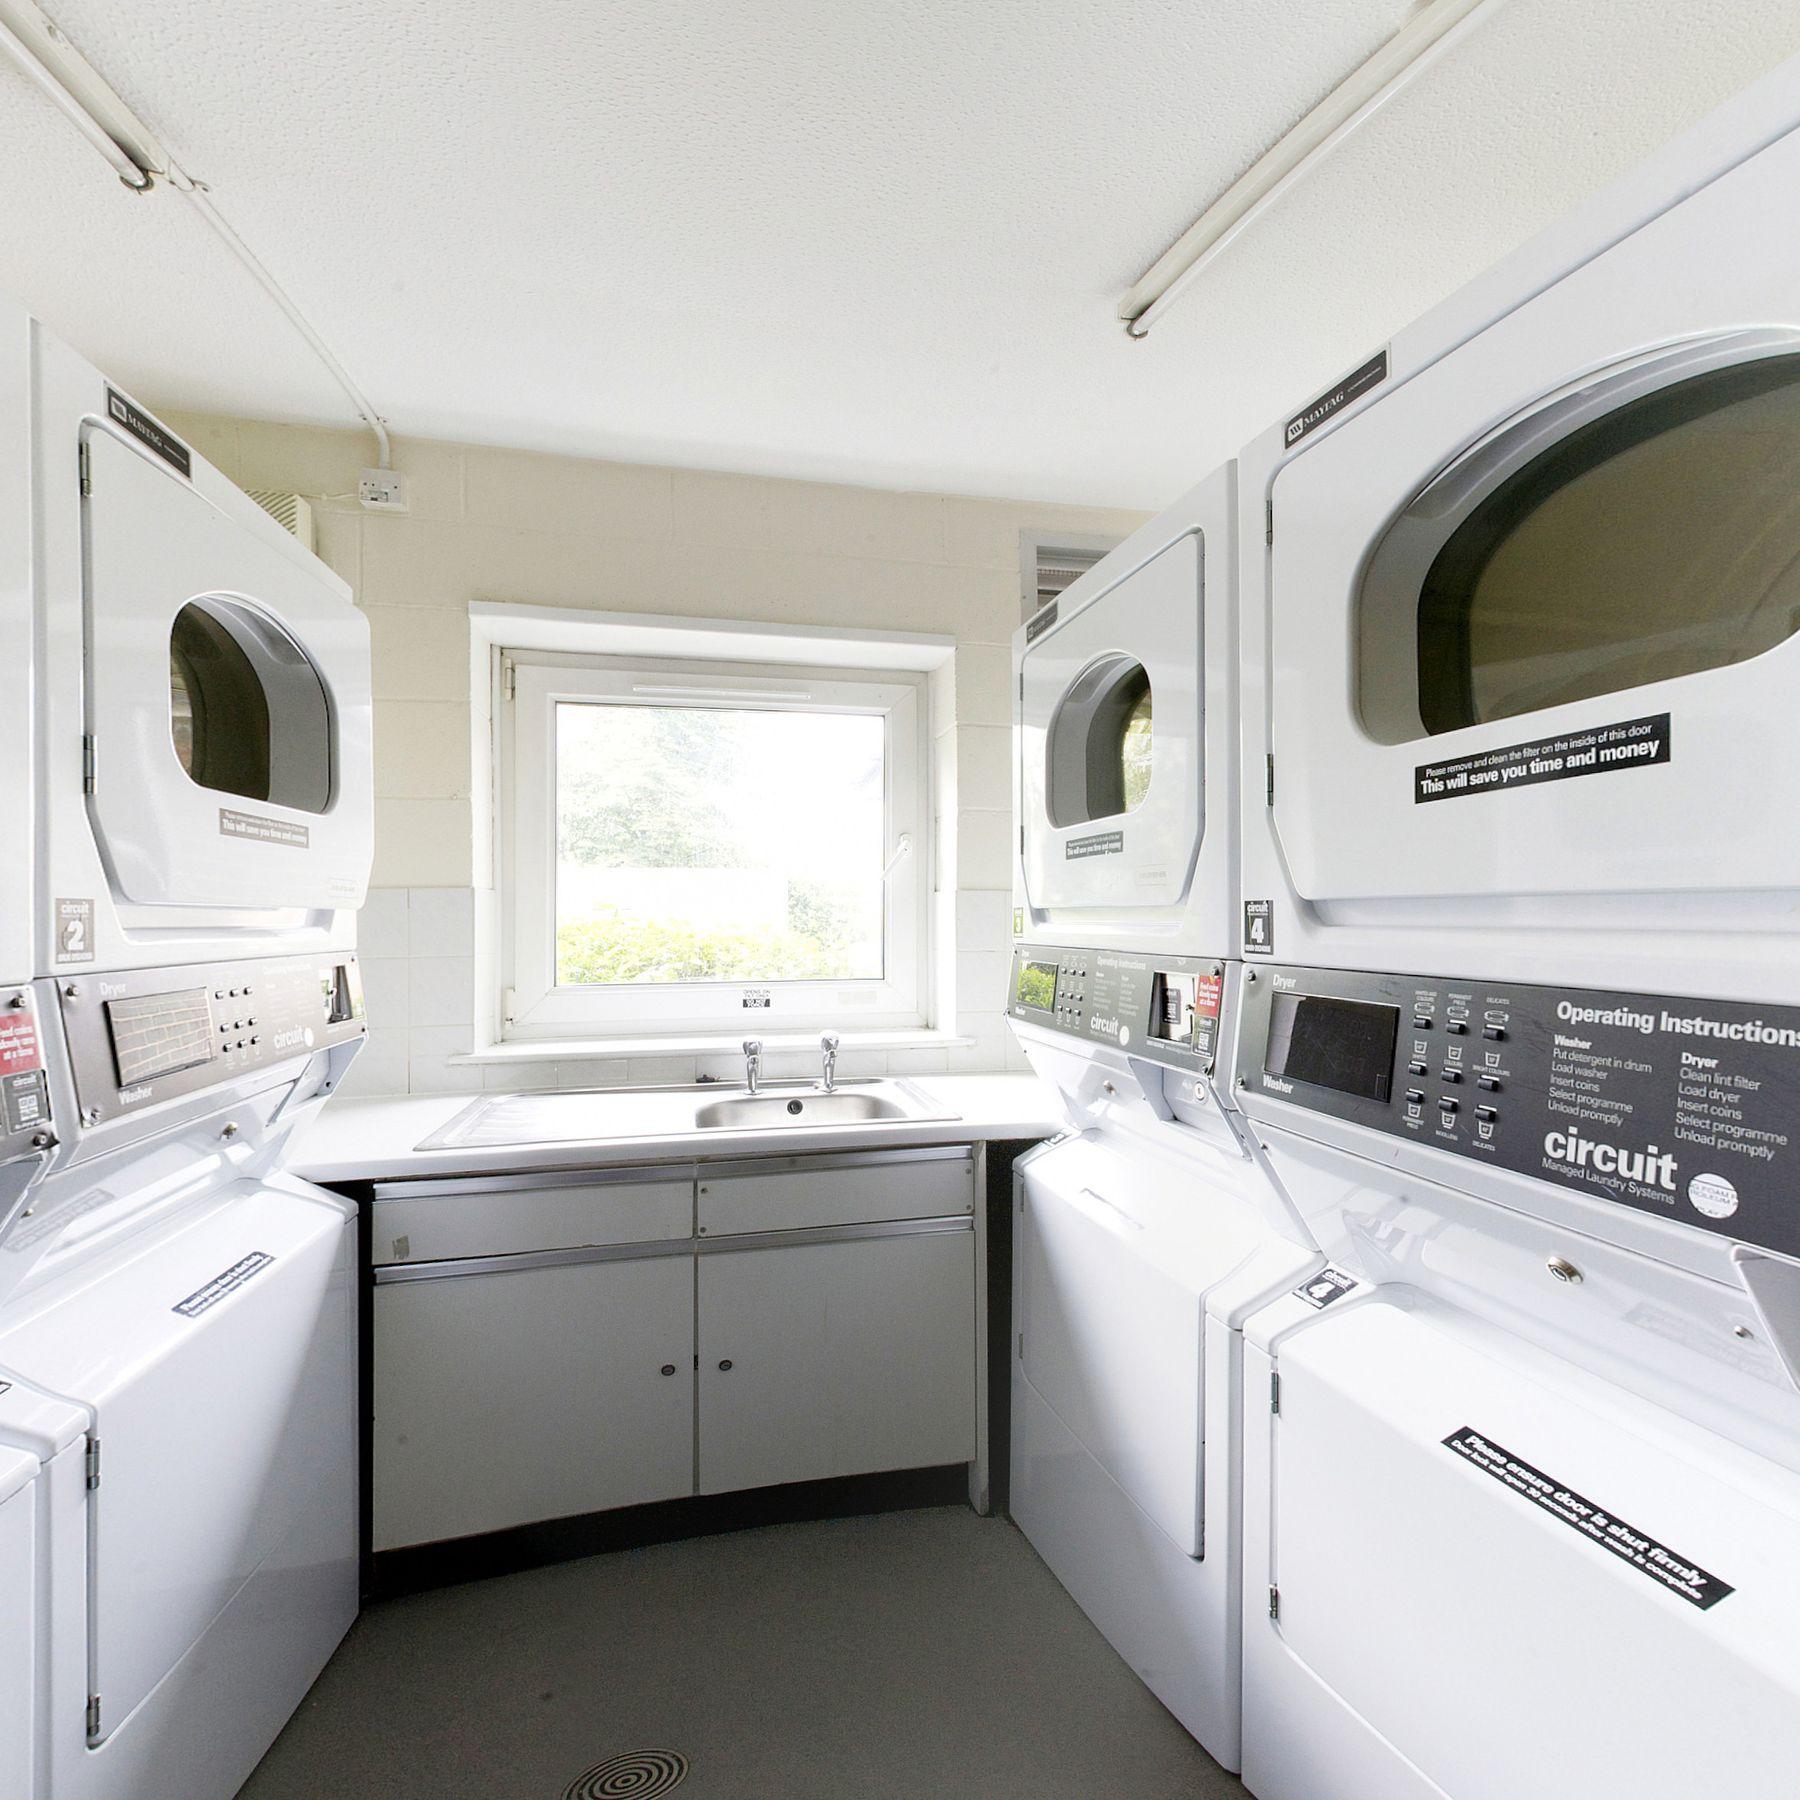 Meridian Court laundry